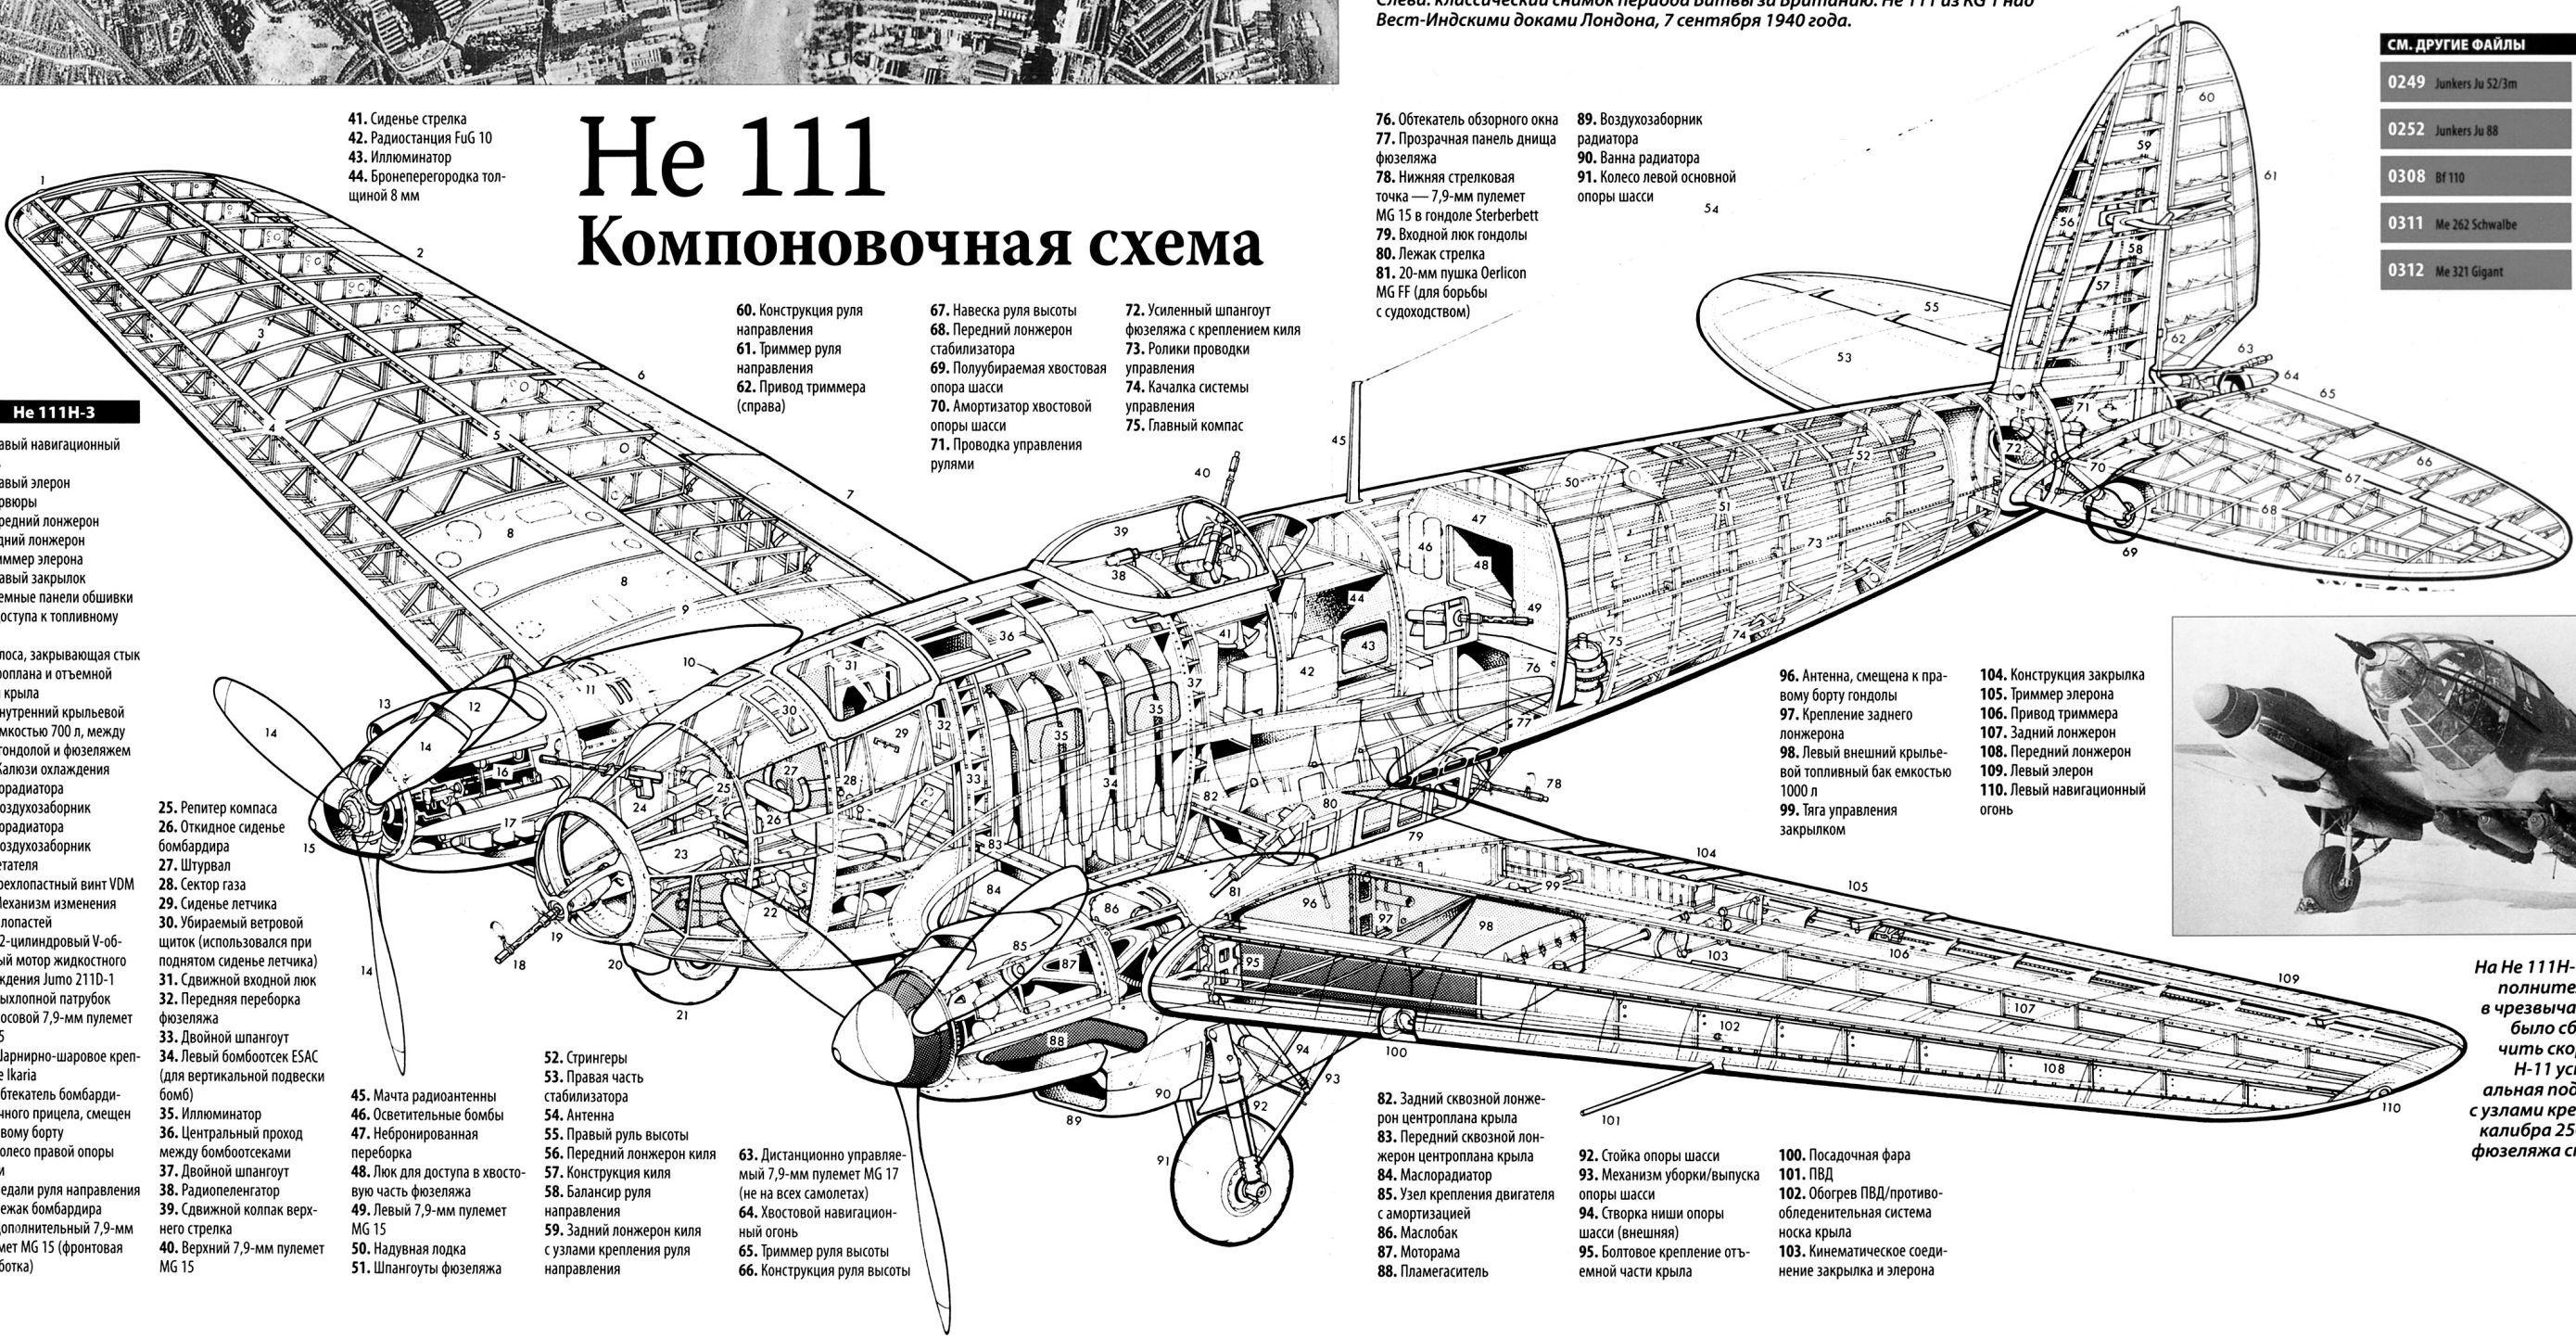 Aircarft Cutaway   aircraft world war 2   Pinterest   Avión, Cortes ...